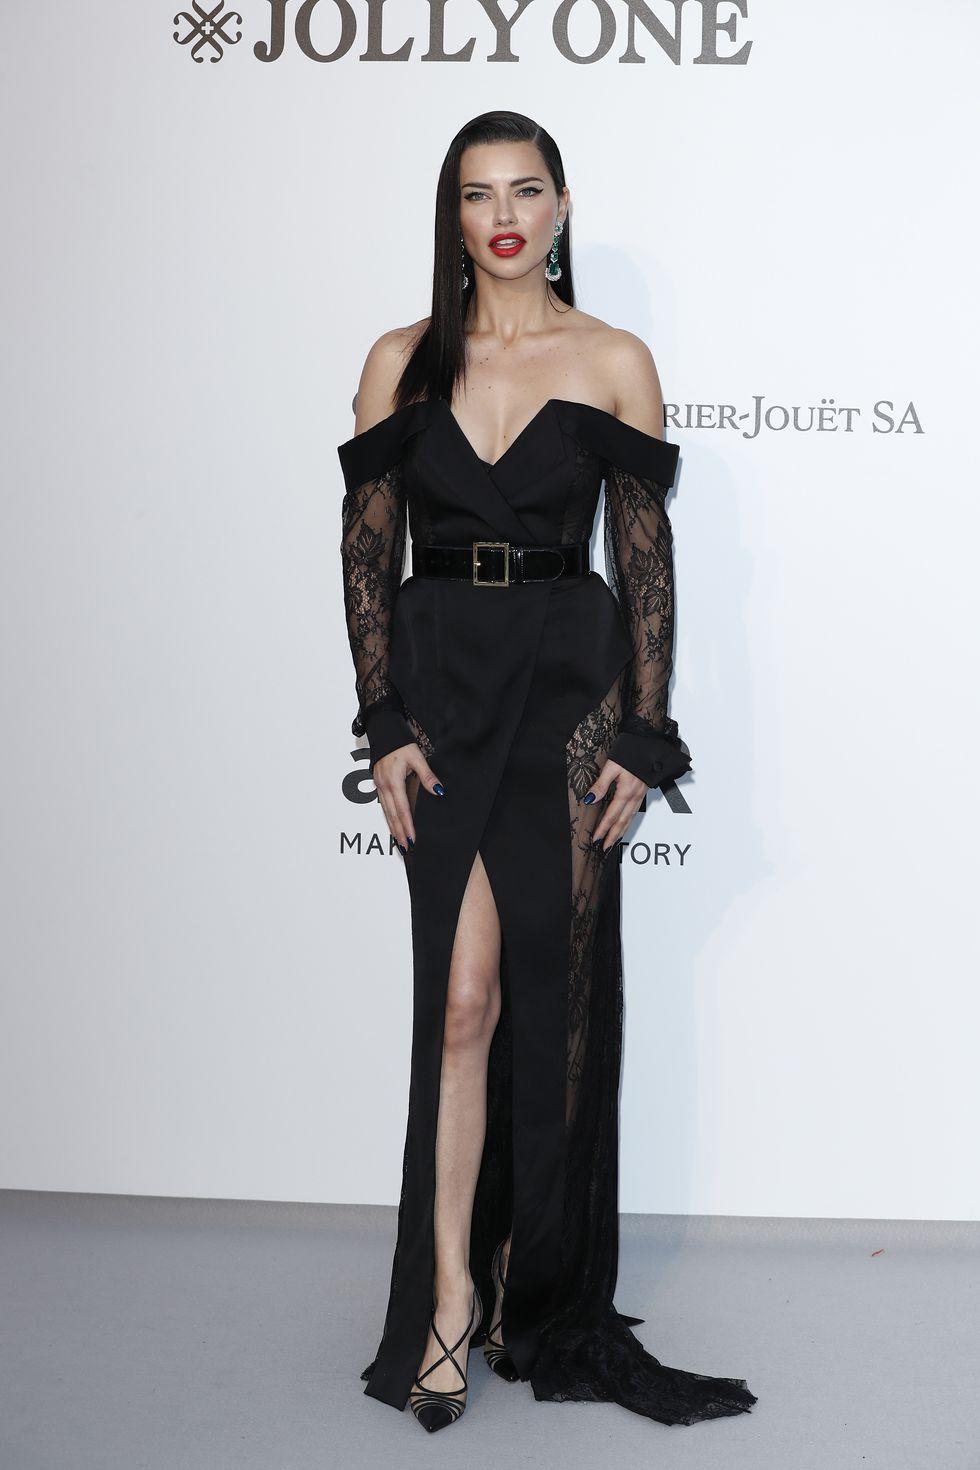 Vedete prezente la amfAR Cannes Gala 2019 (GALERIE FOTO)